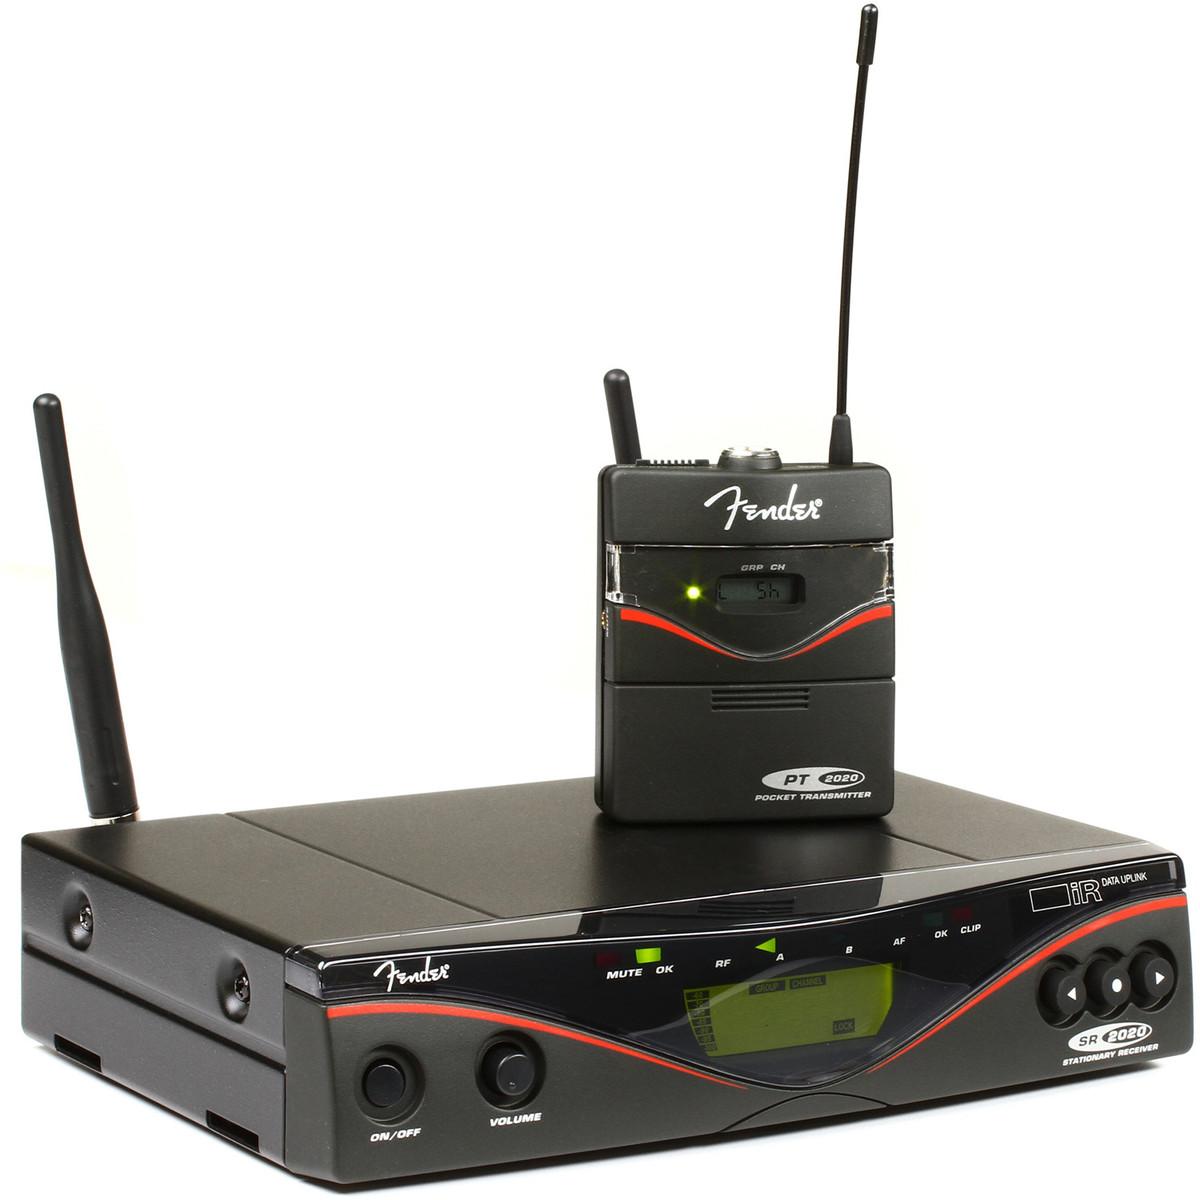 disc fender fwg2020 wireless system band 10 at gear4music. Black Bedroom Furniture Sets. Home Design Ideas